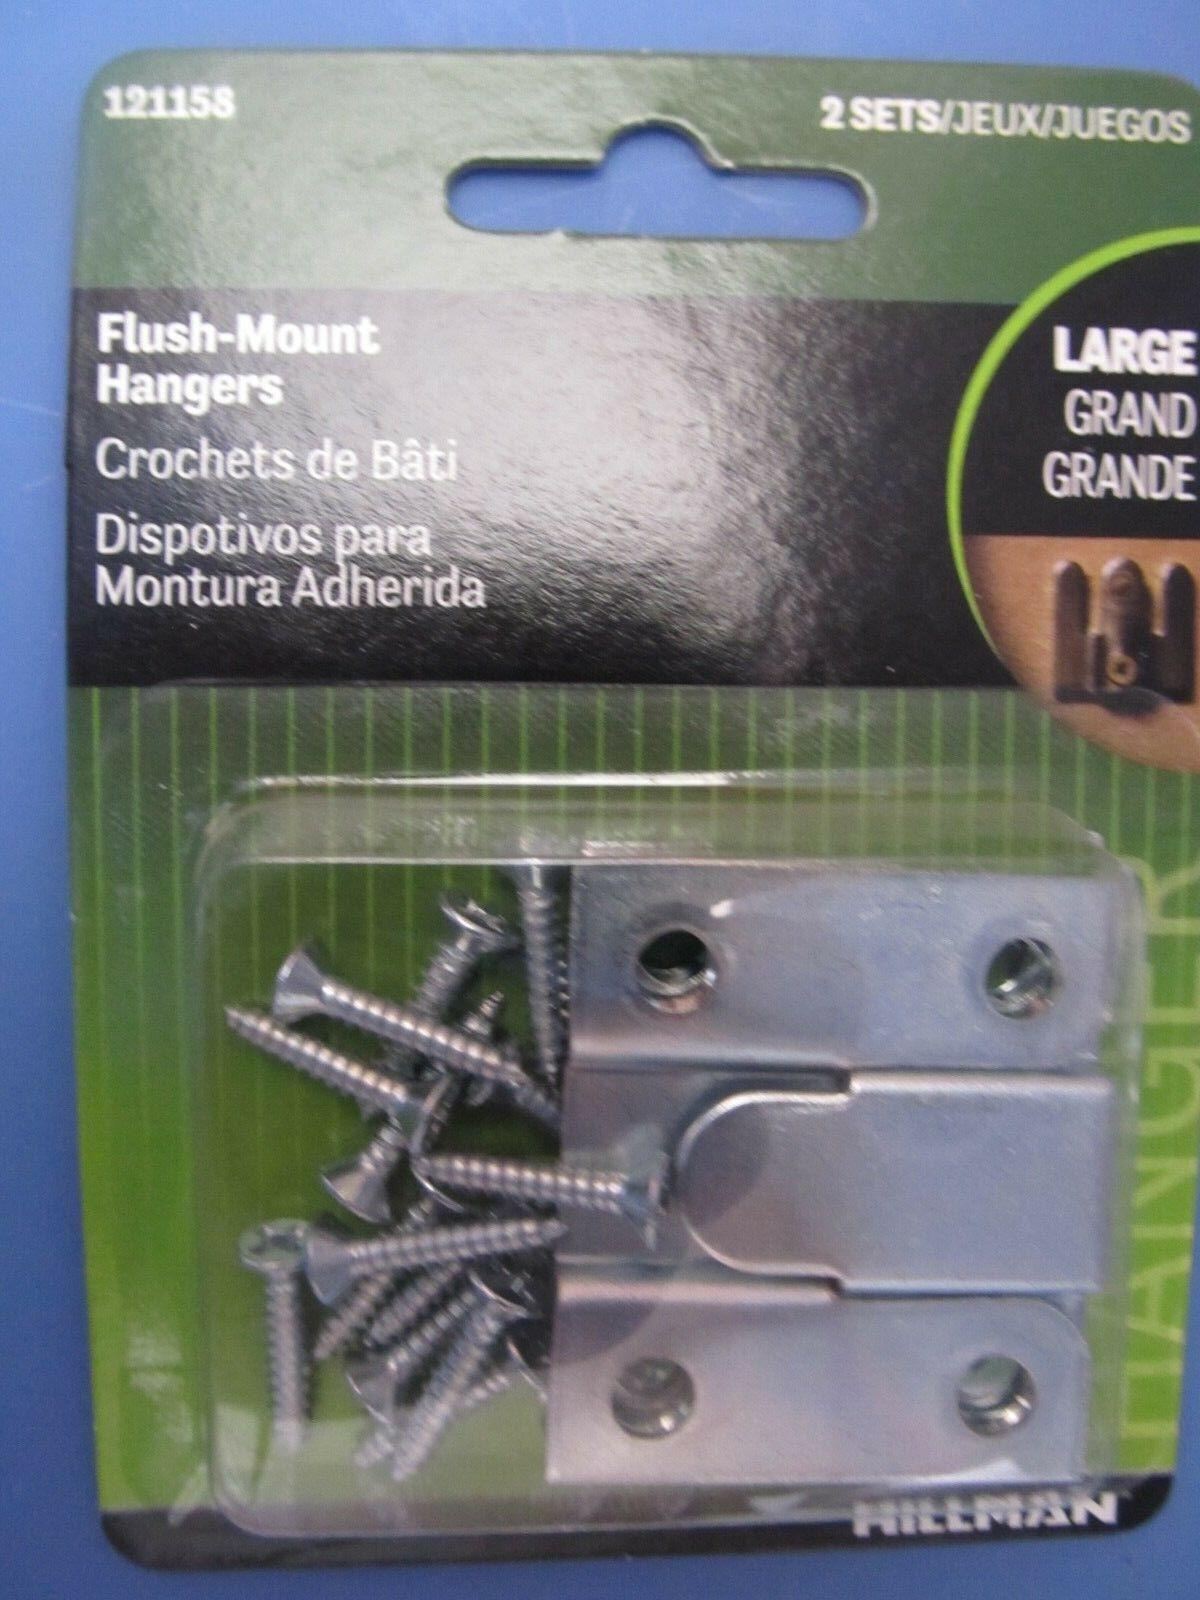 "Hillman Flush Mount Hangers 1.75/"" x 1.5/""  Package of 2 #121158    NEW"